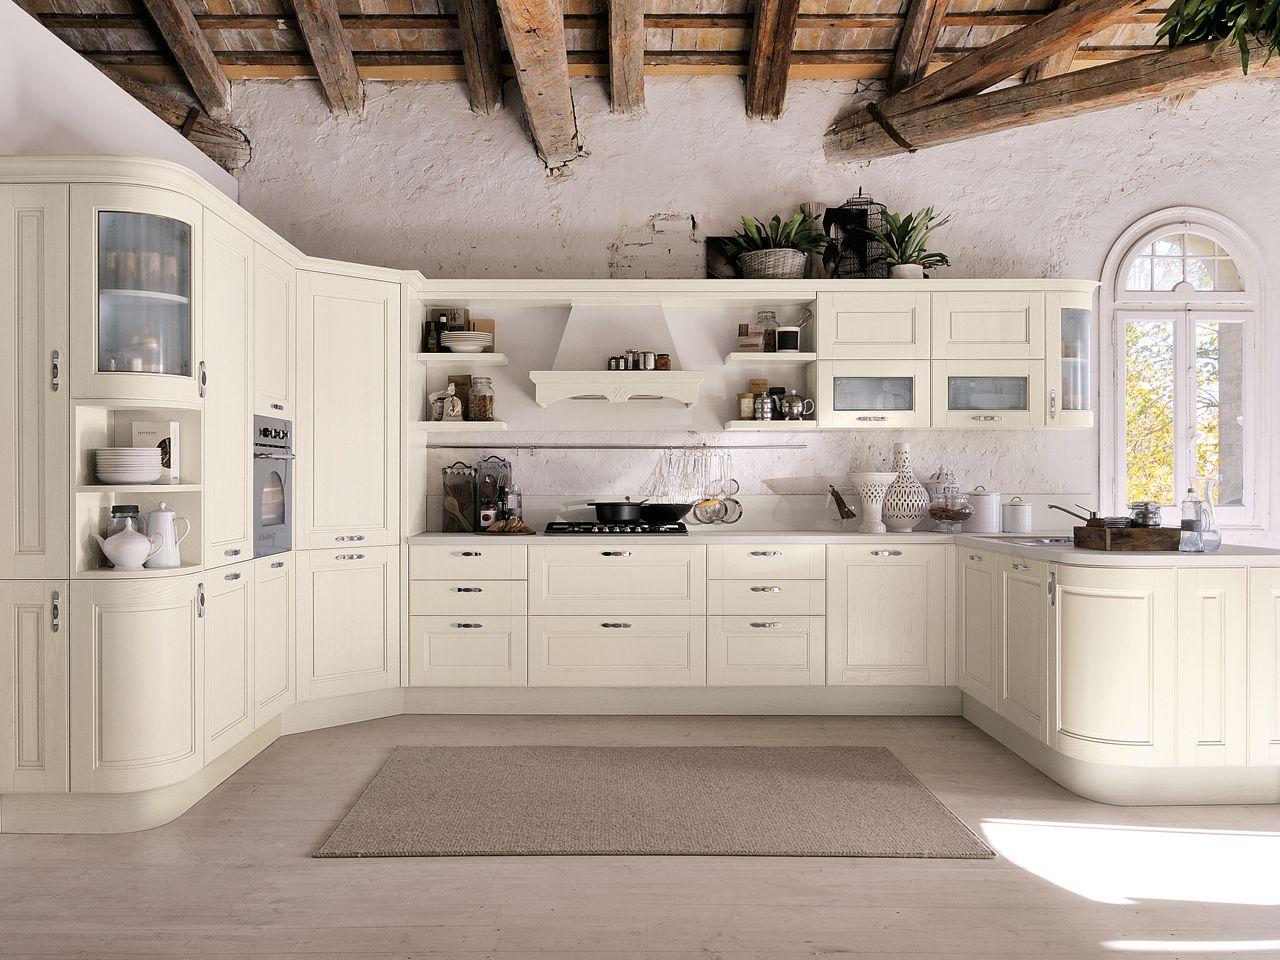 AGNESE Cucina Lube Classica Cucina senza tempo, Cucina